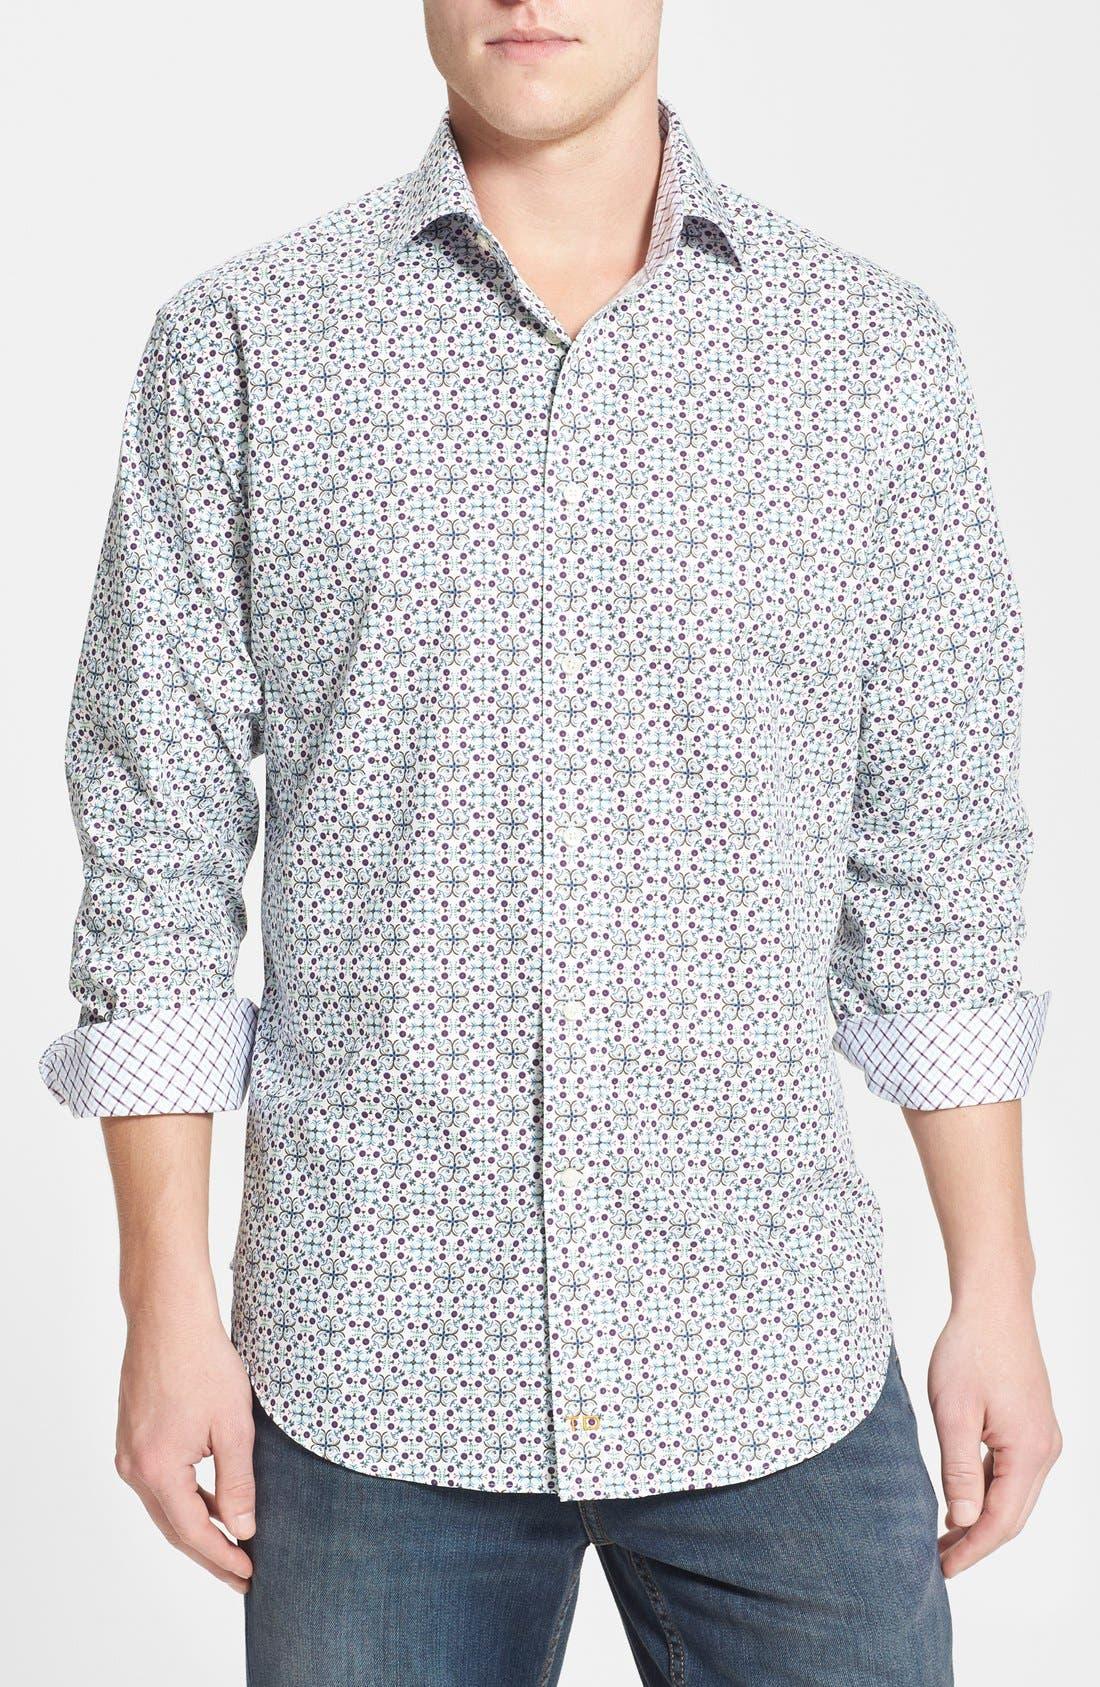 Main Image - Thomas Dean Regular Fit Print Sport Shirt